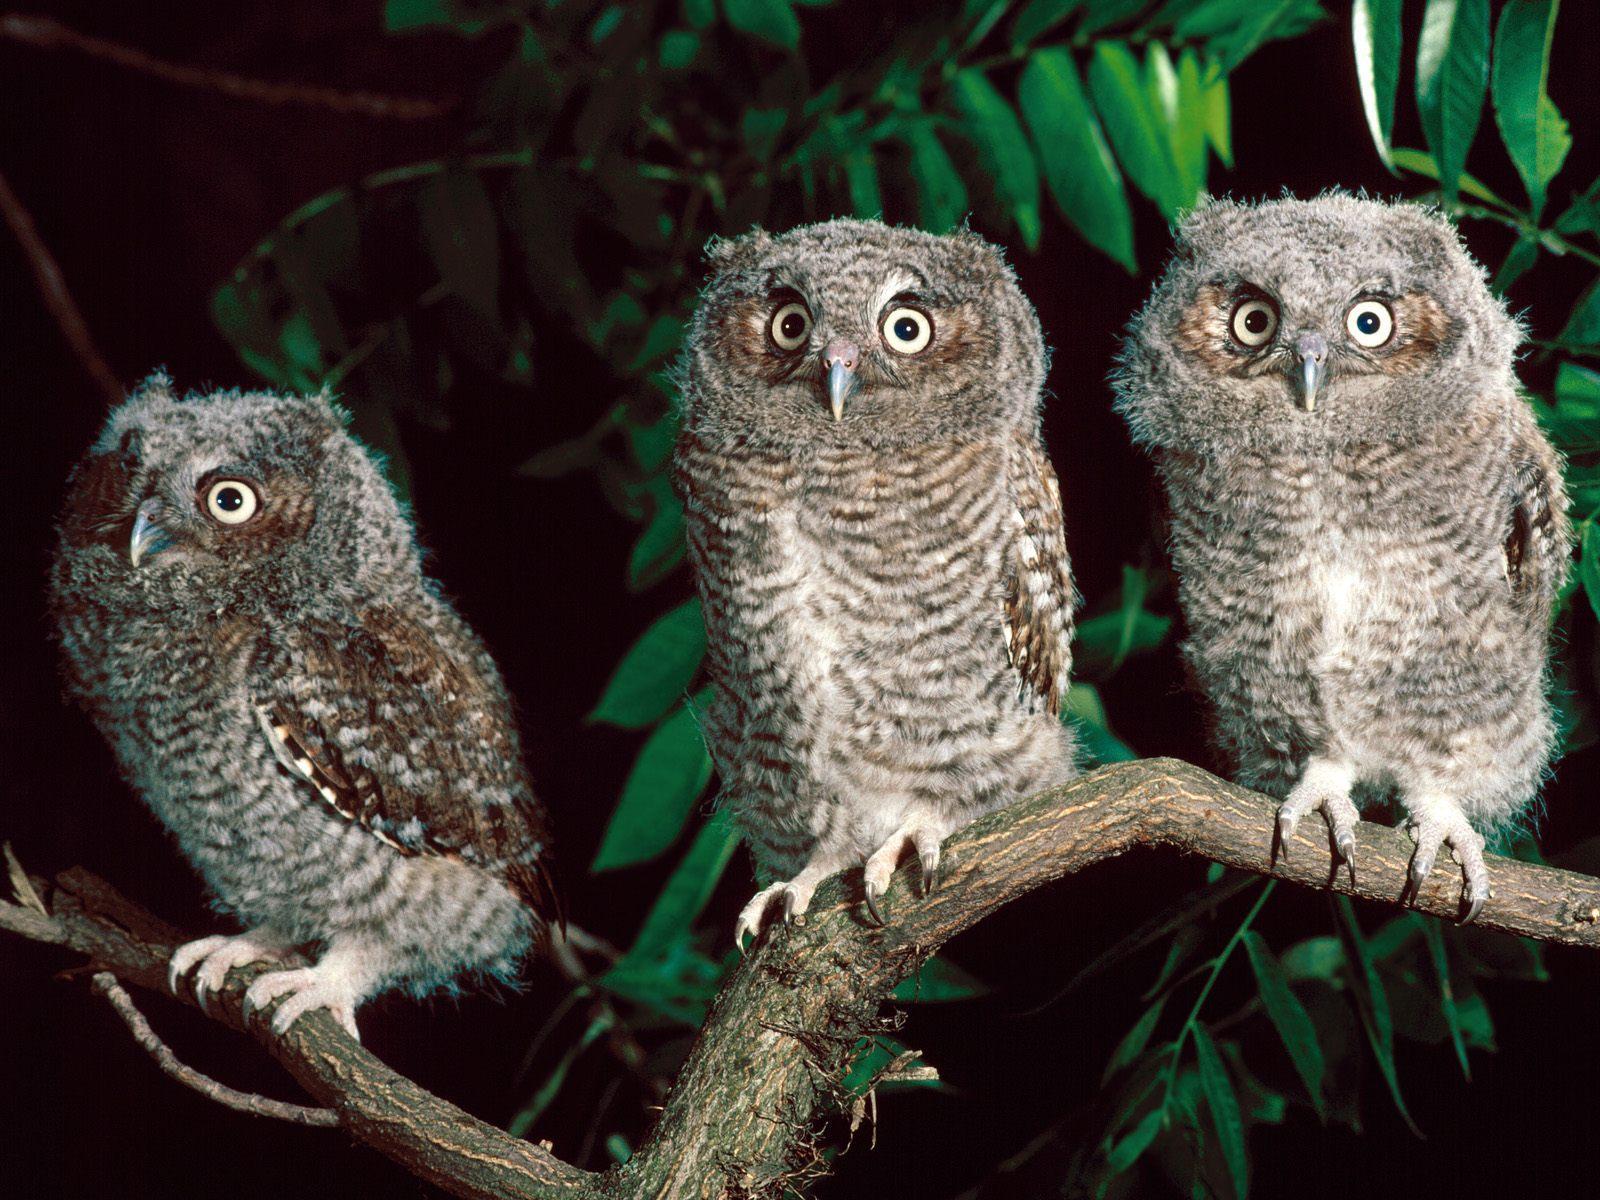 hd wallpaper owl